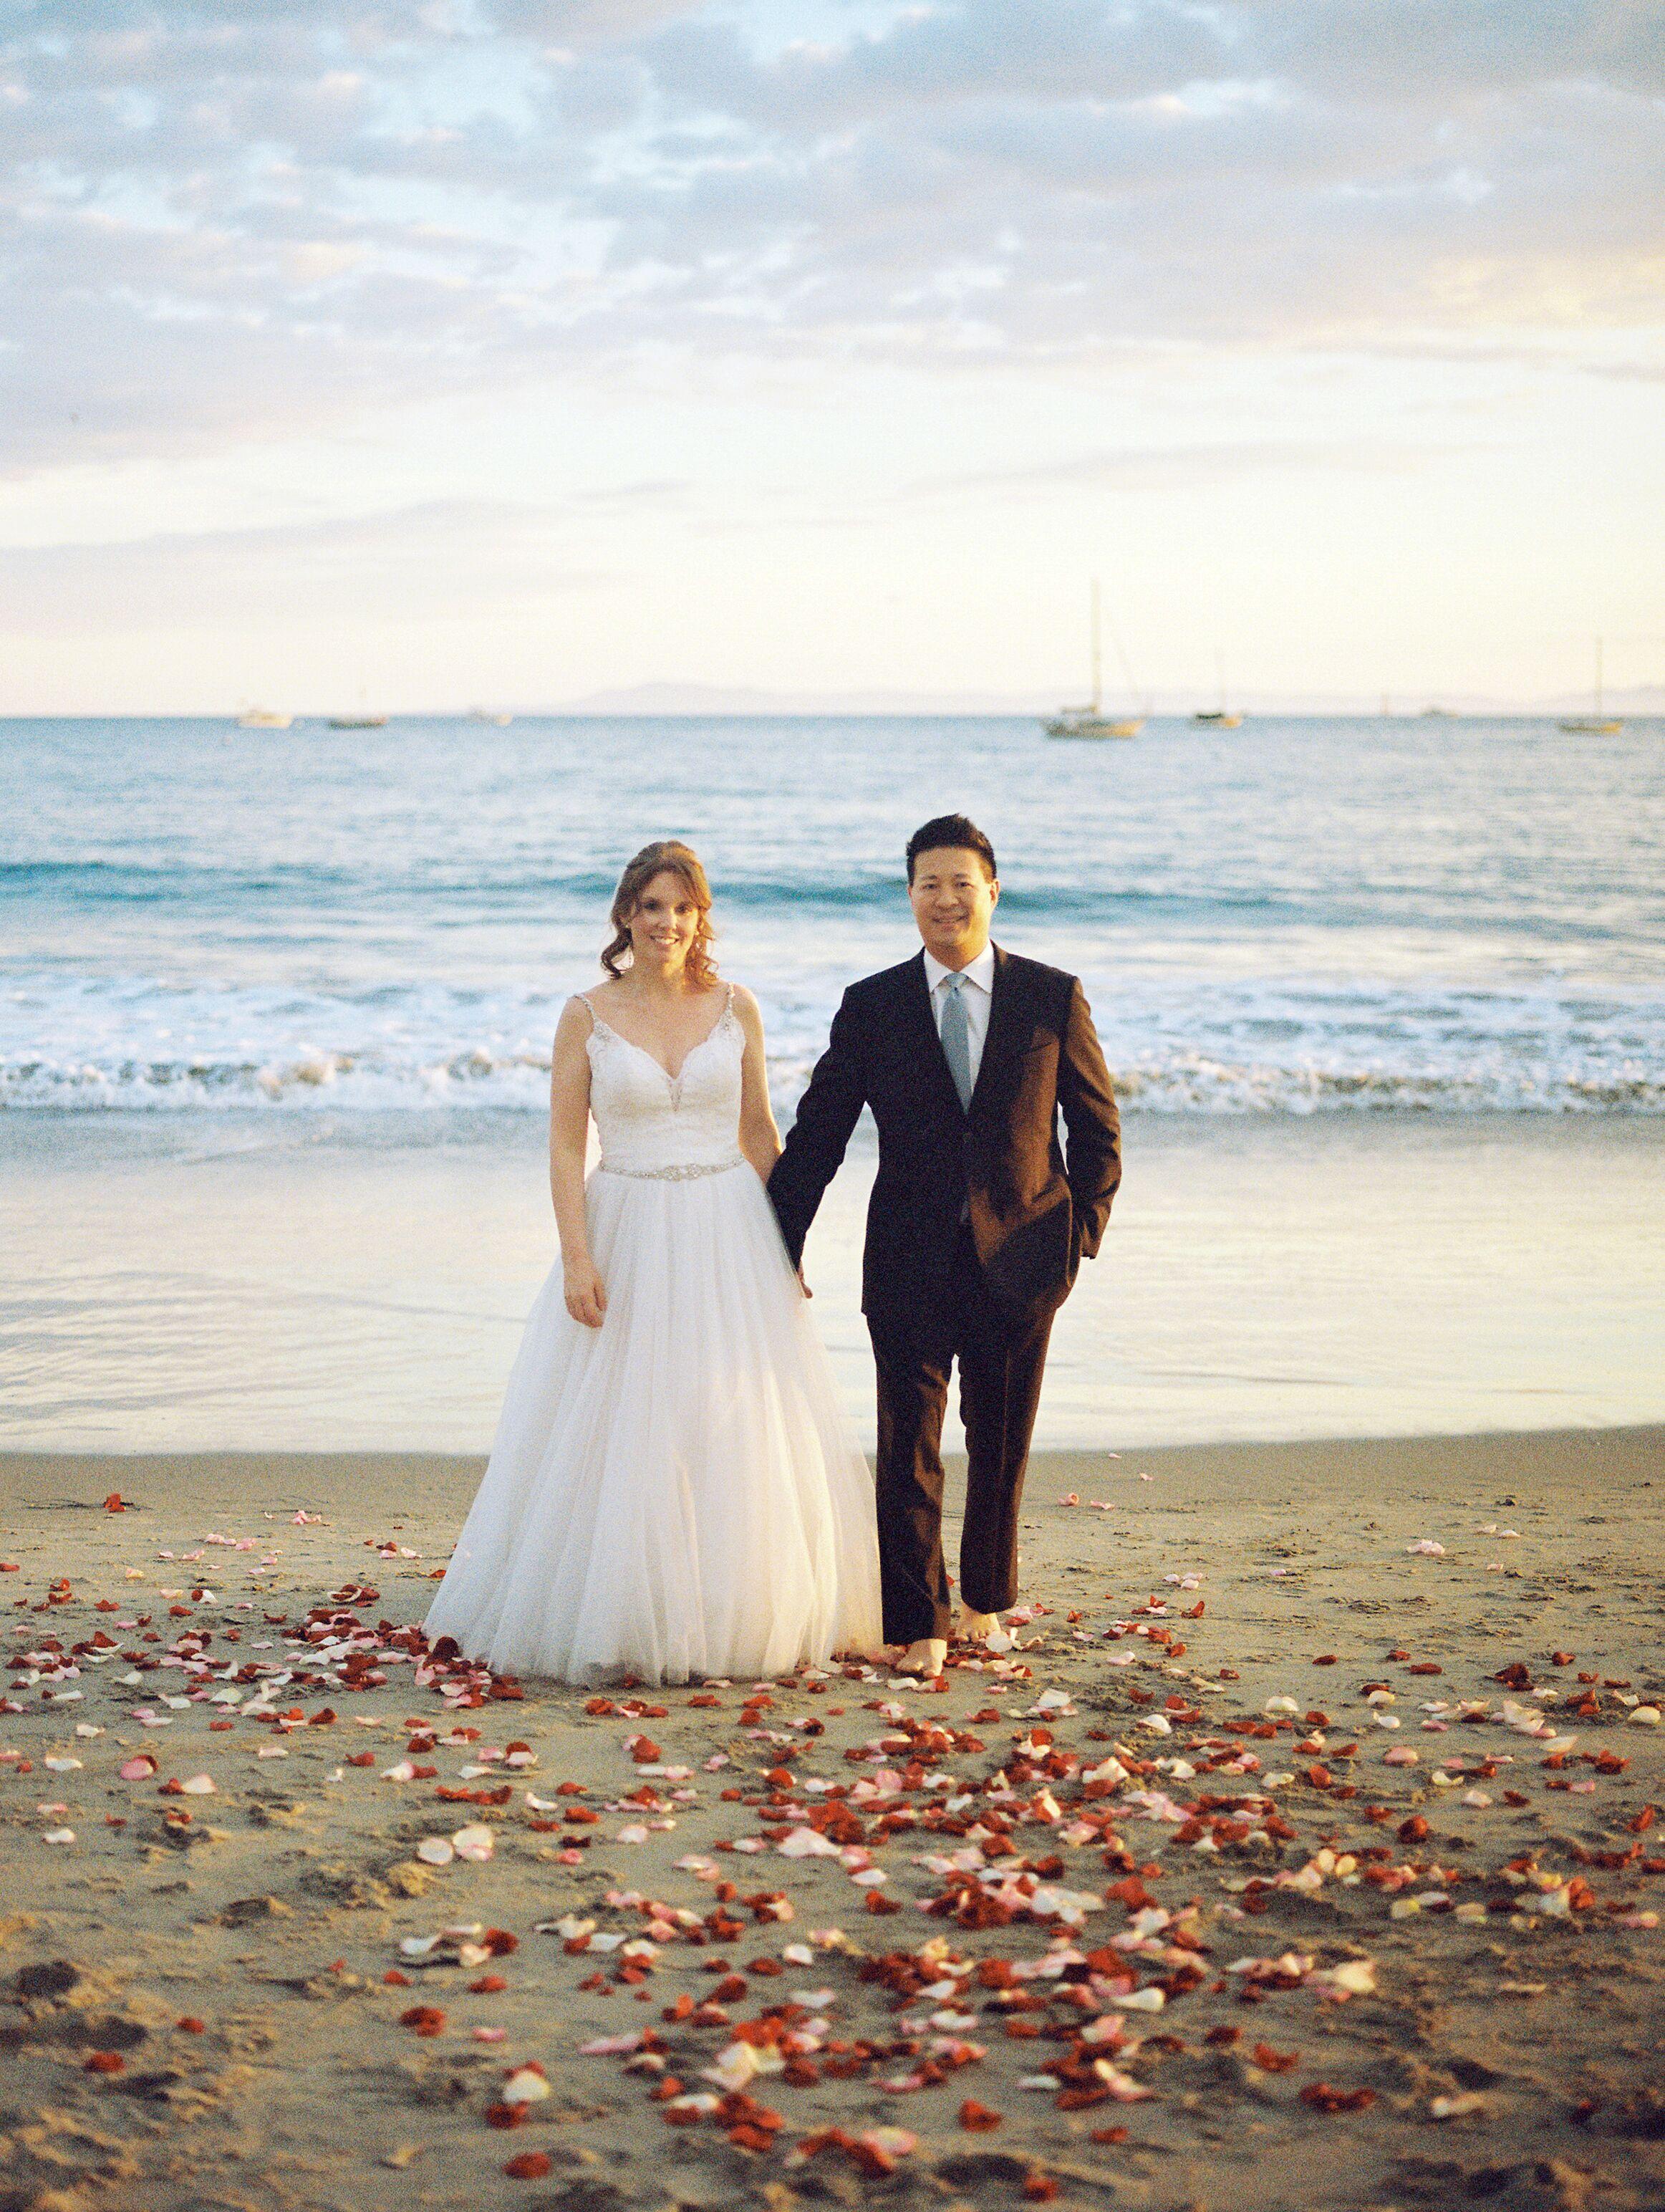 www.santabarbawedding.com | Venue: Santa Barbara Courthouse | Photography: Ryanne Bee Photography | Officiant: Santa Barbara Classic Weddings | Bride and Groom on the Beach